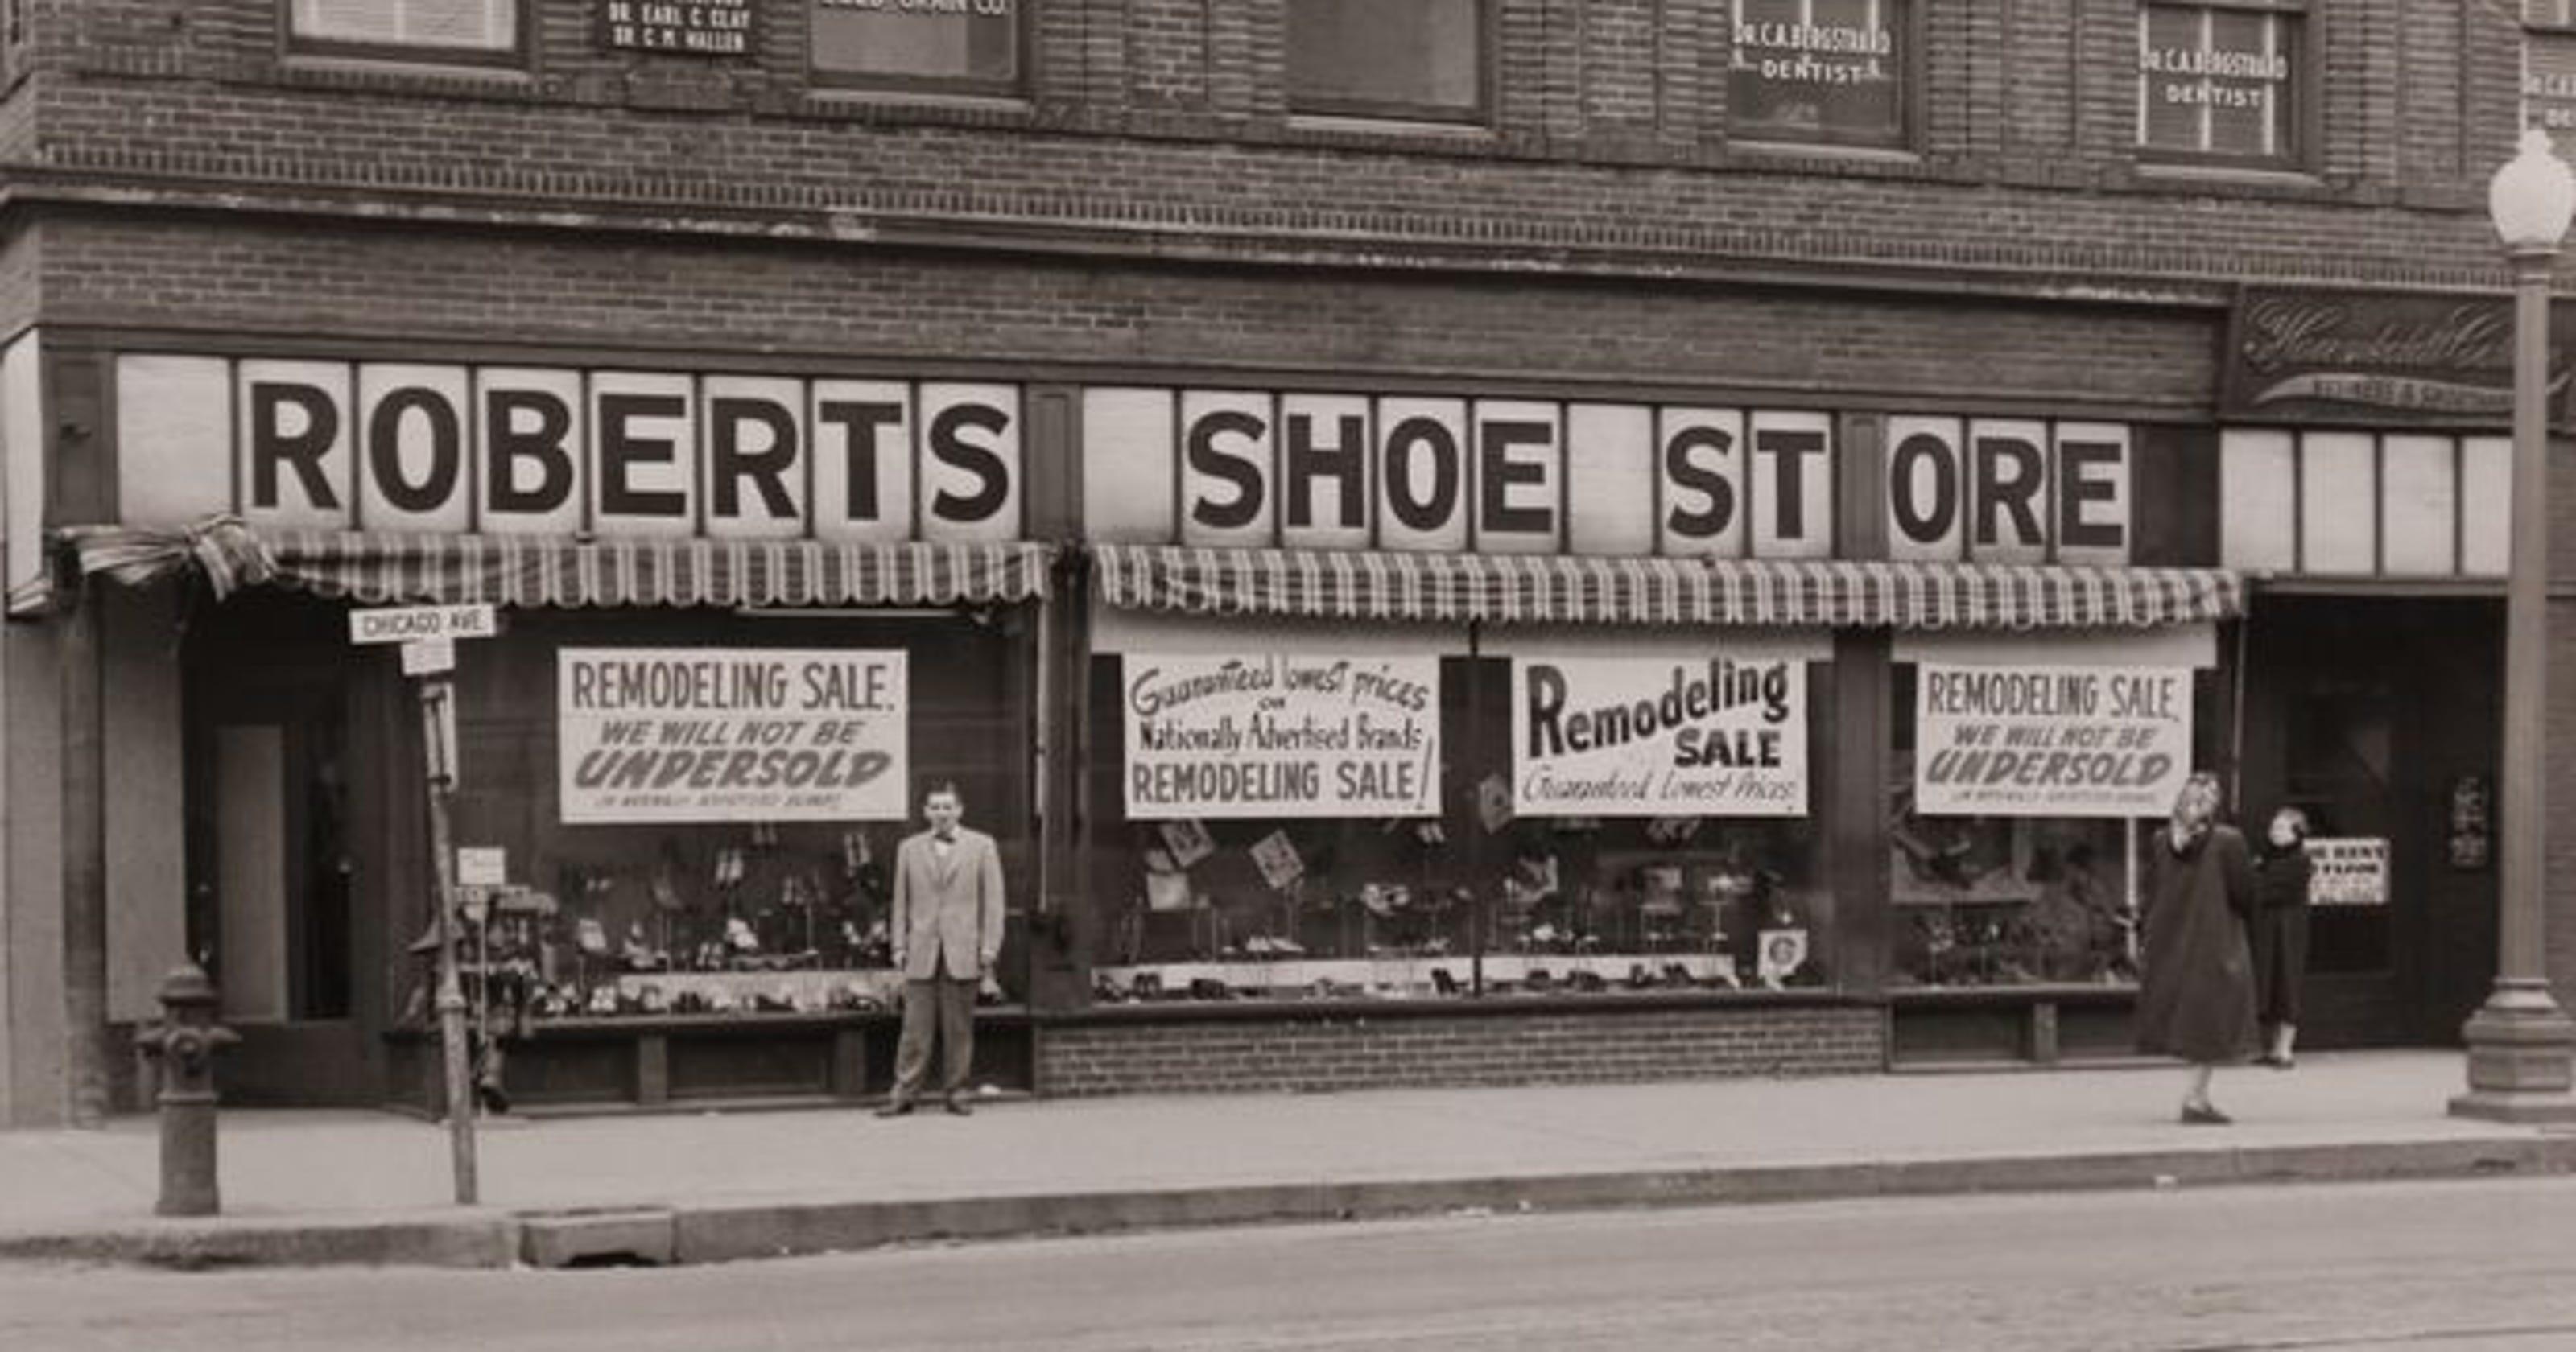 Roberts Shoe Store Closing